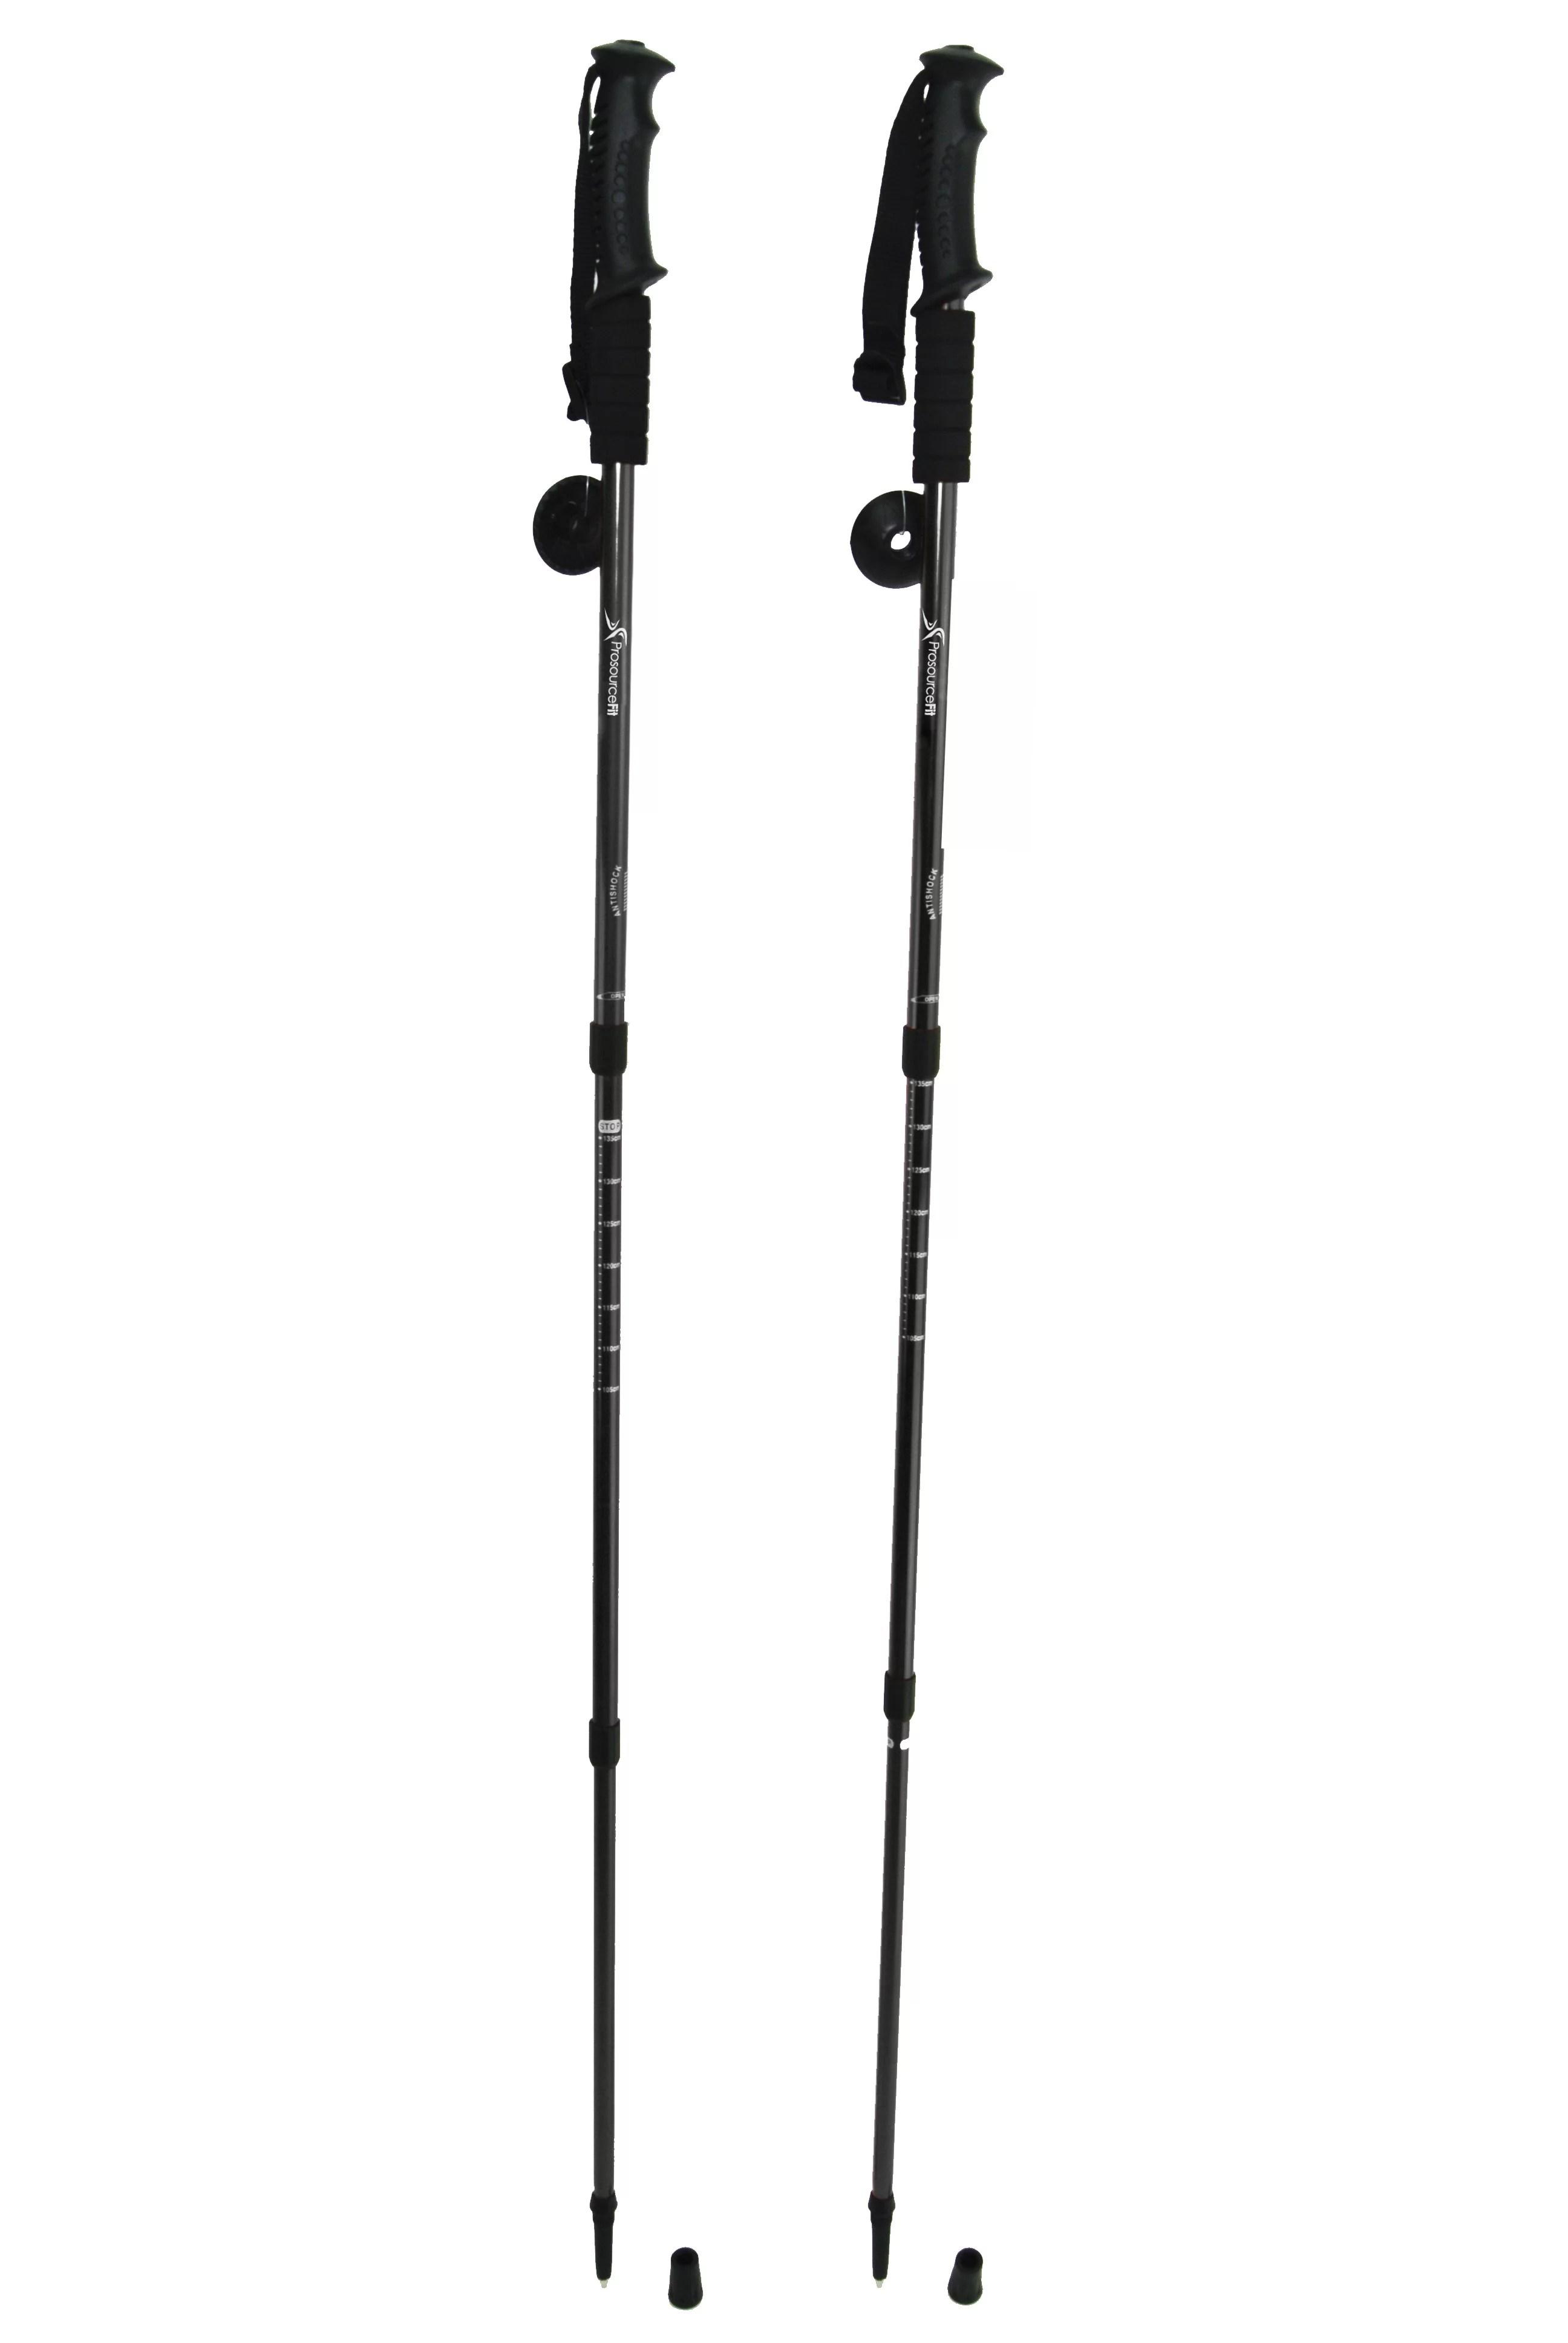 Prosourcefit Anti Shock Trekking Poles Adjustable Set Of 2 Aluminum Telescopic Poles With